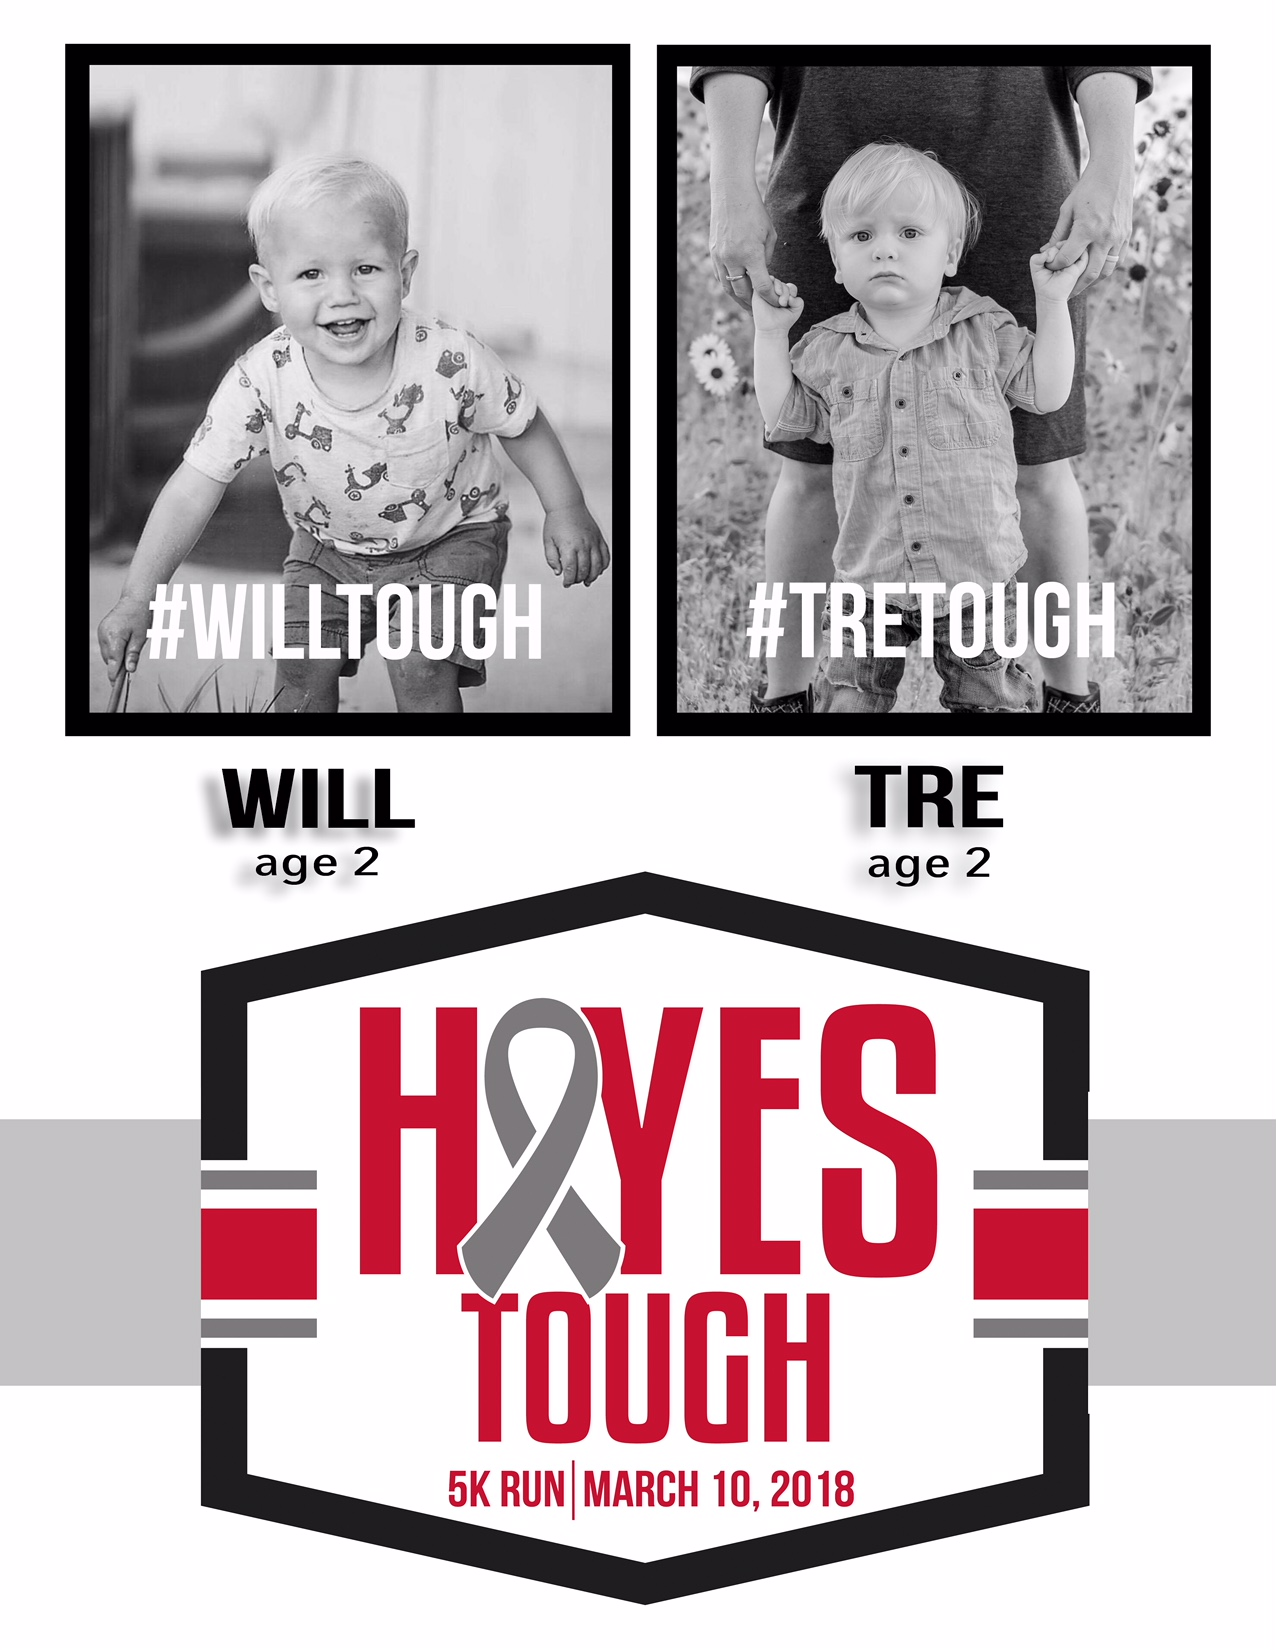 HayesTough Warriors